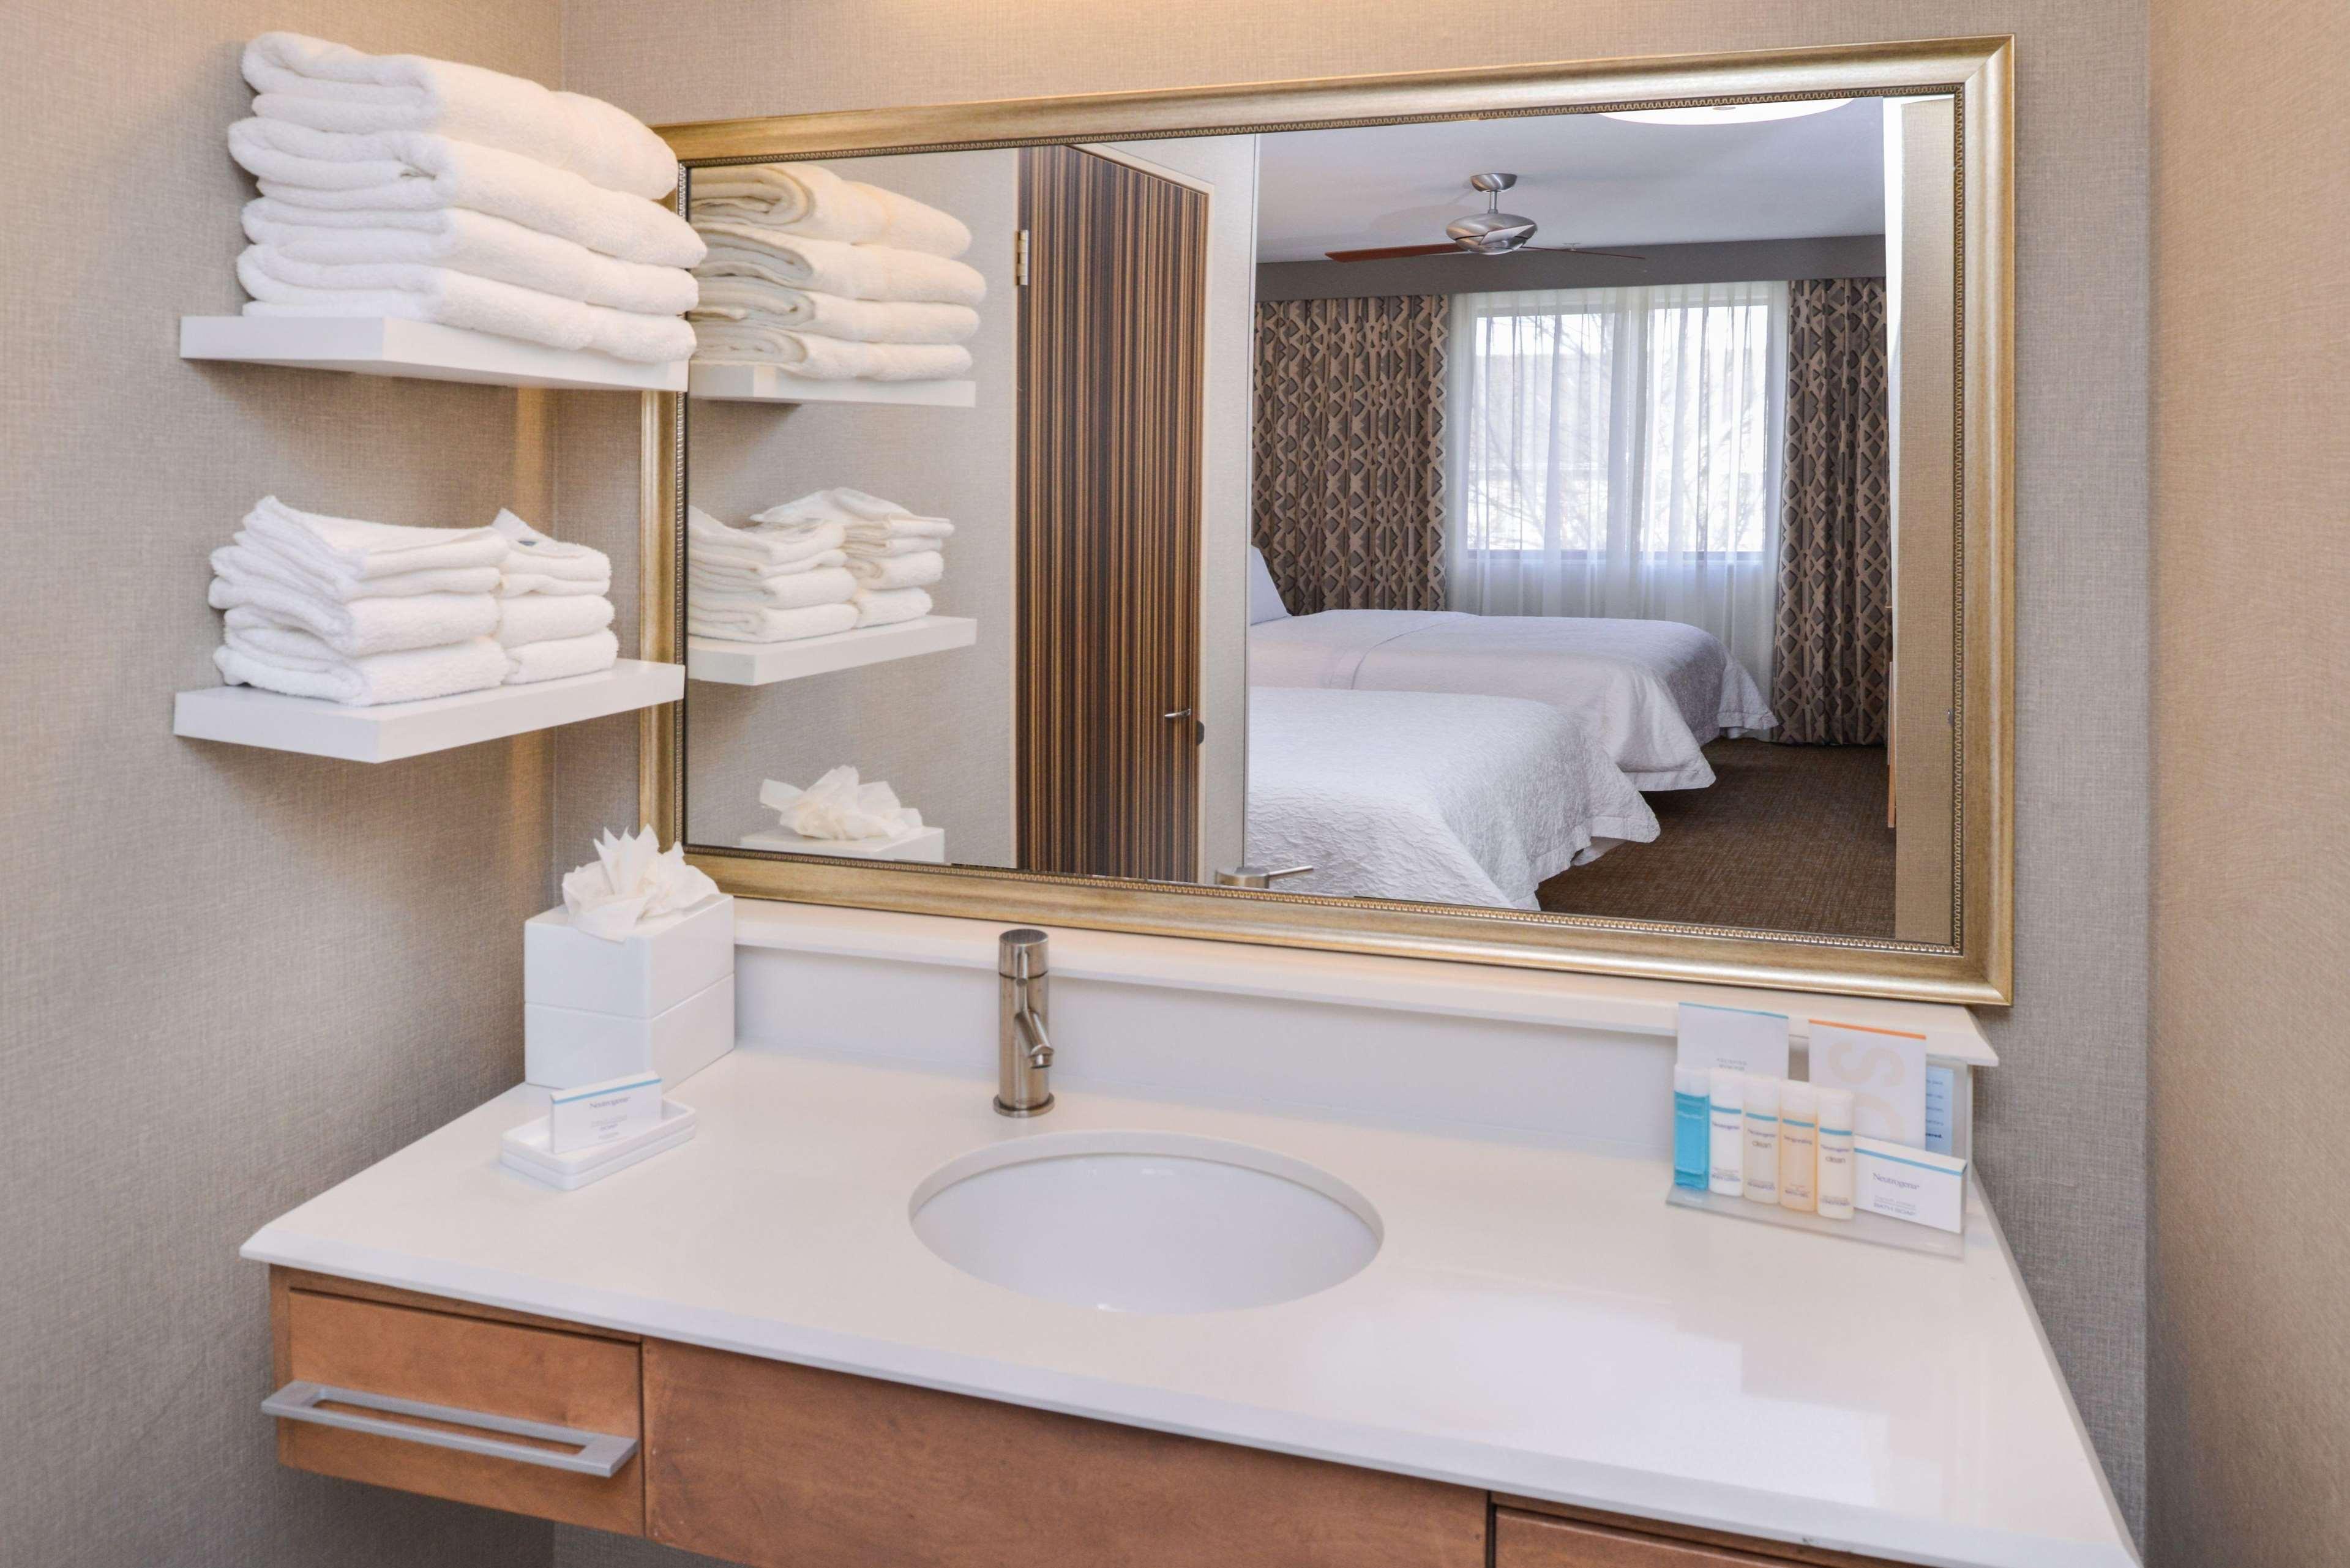 Hampton Inn & Suites Denver-Speer Boulevard image 17